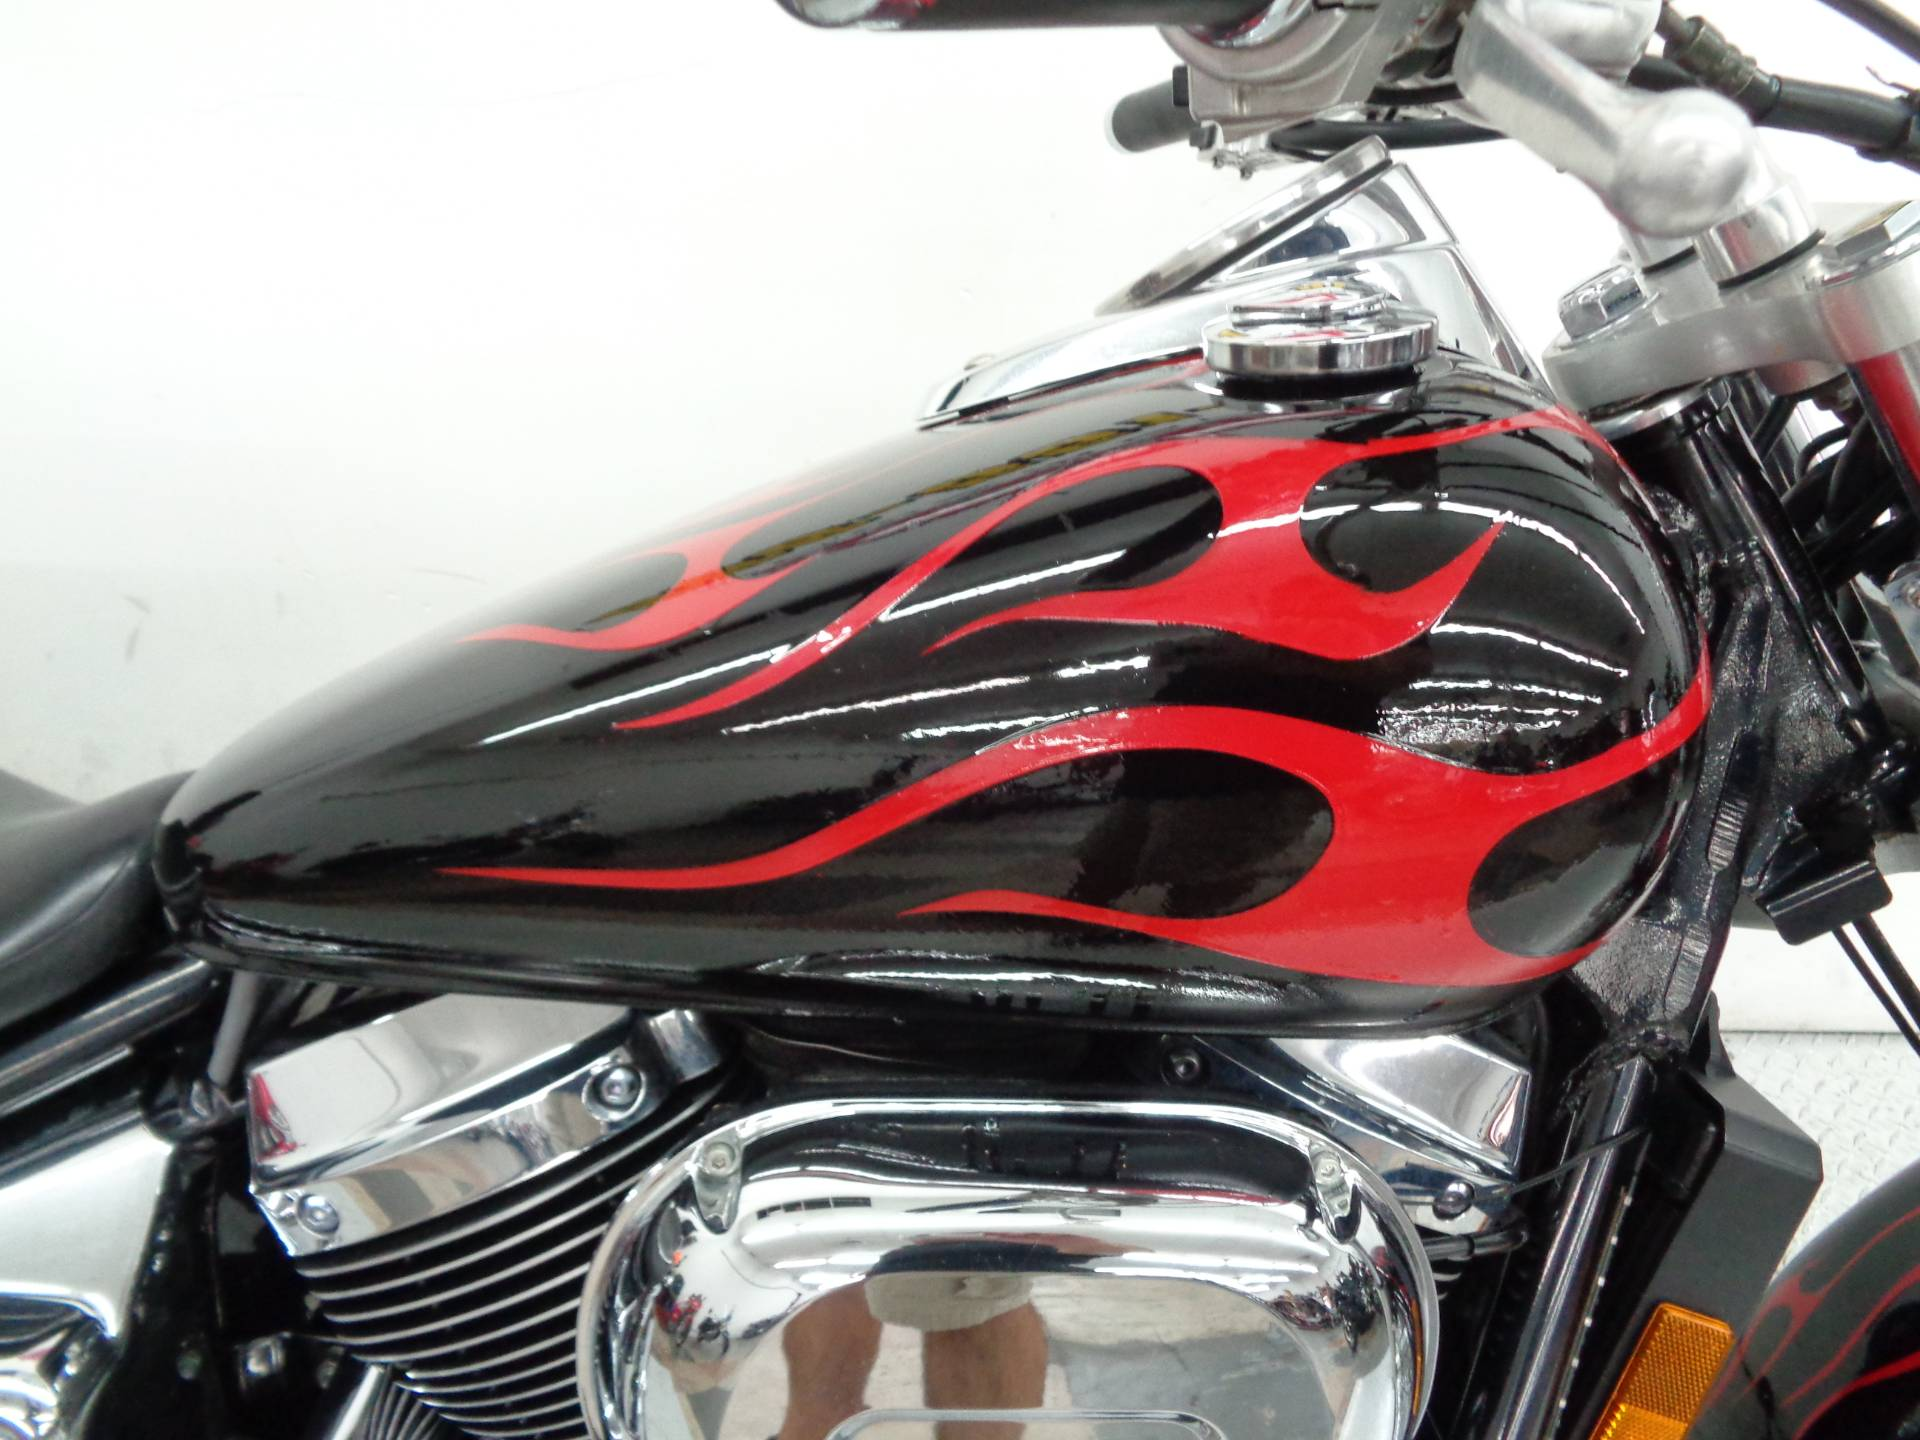 Used 2007 Honda Shadow Spirit 750 C2 Motorcycles In Tulsa Ok